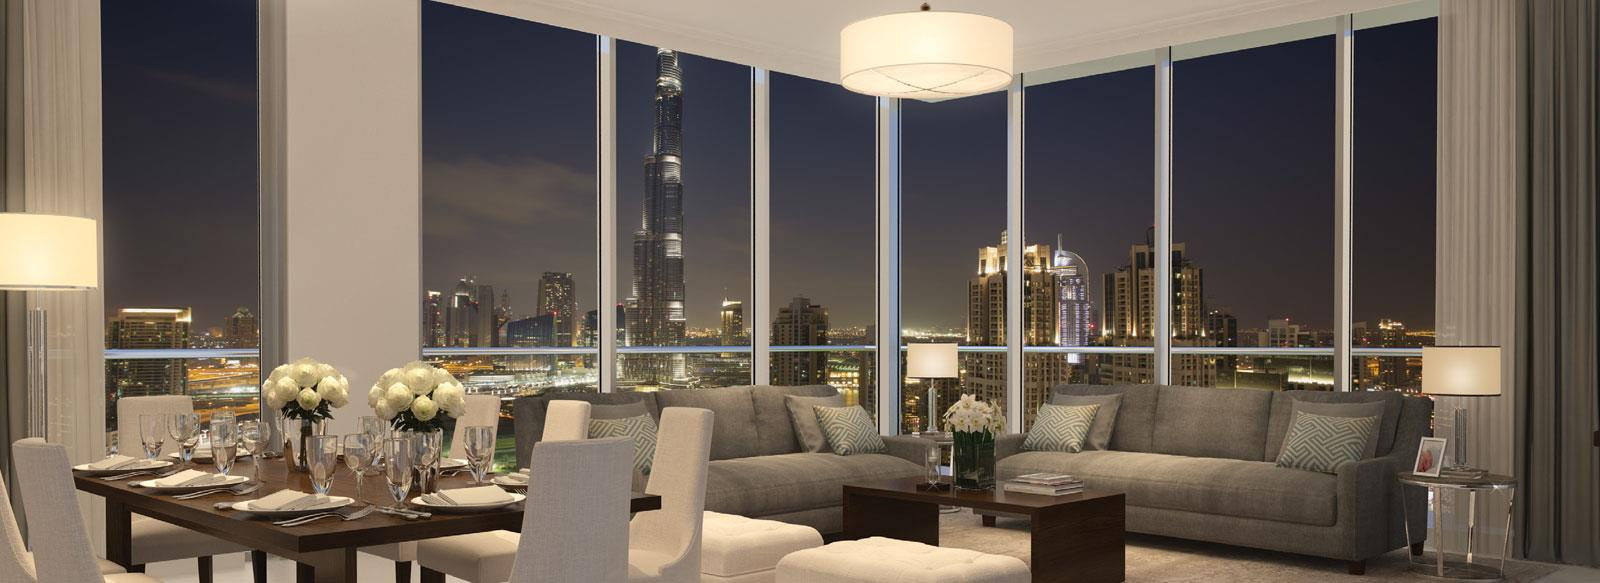 Blvd Crescent Apartments by Emaar - Downtown Dubai